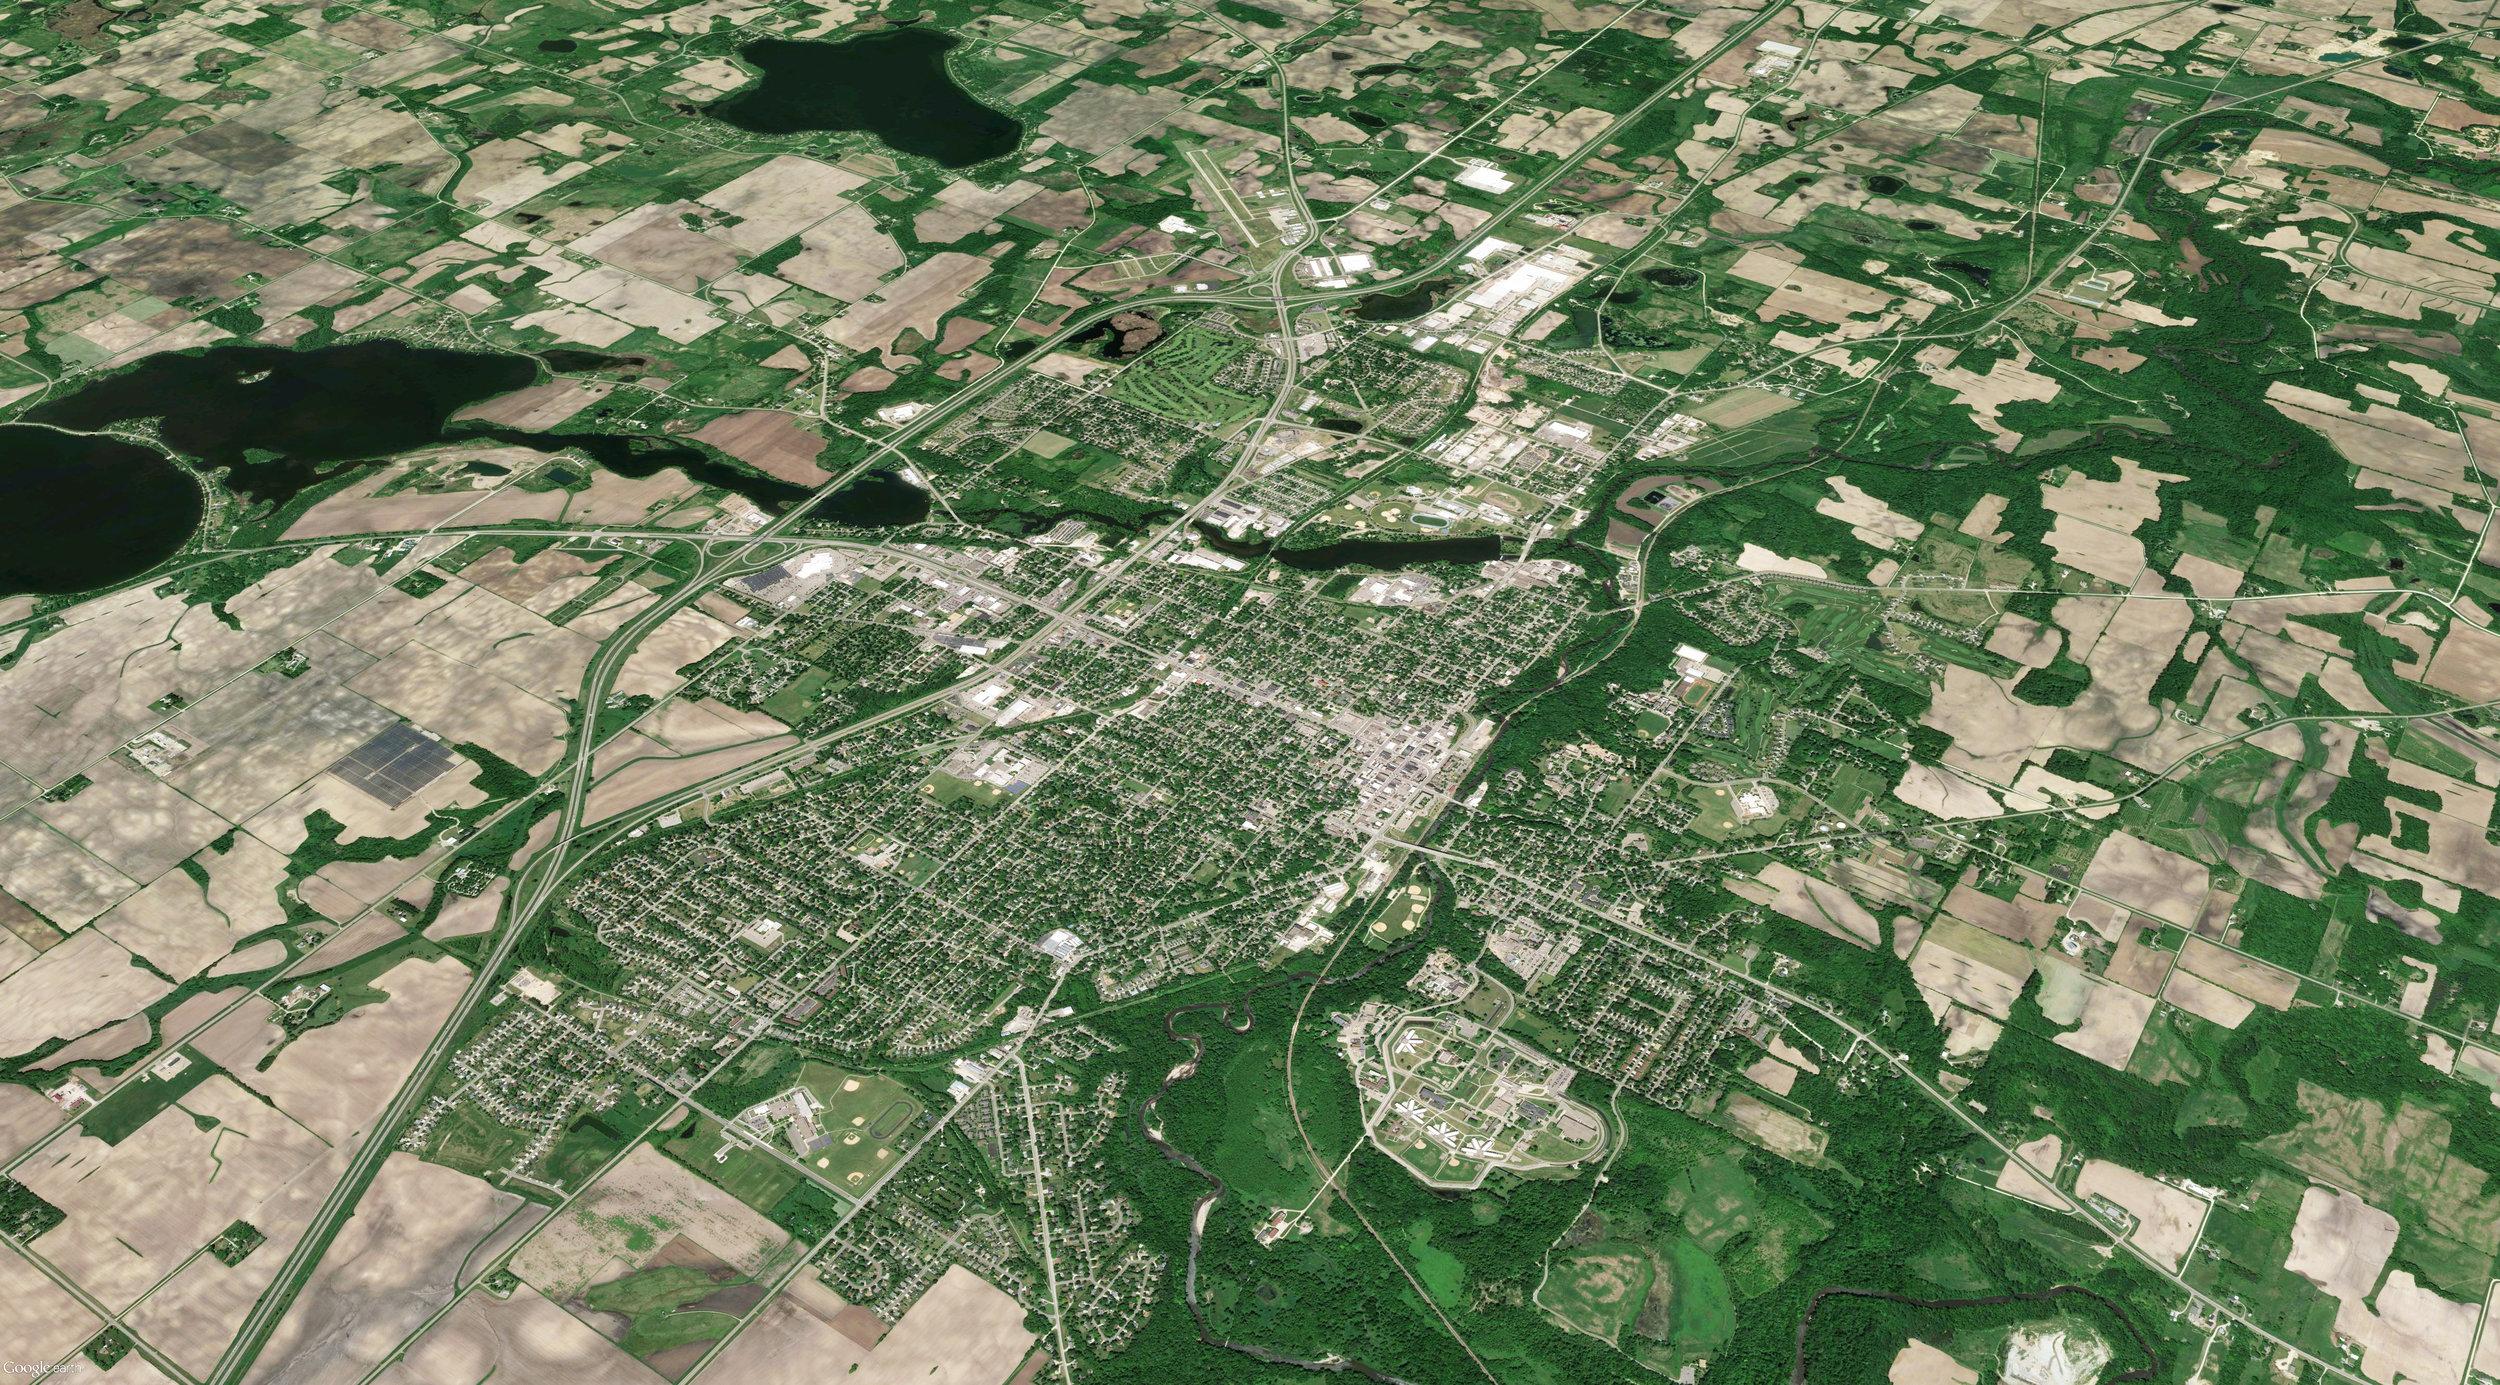 City_aerial_edited.jpg